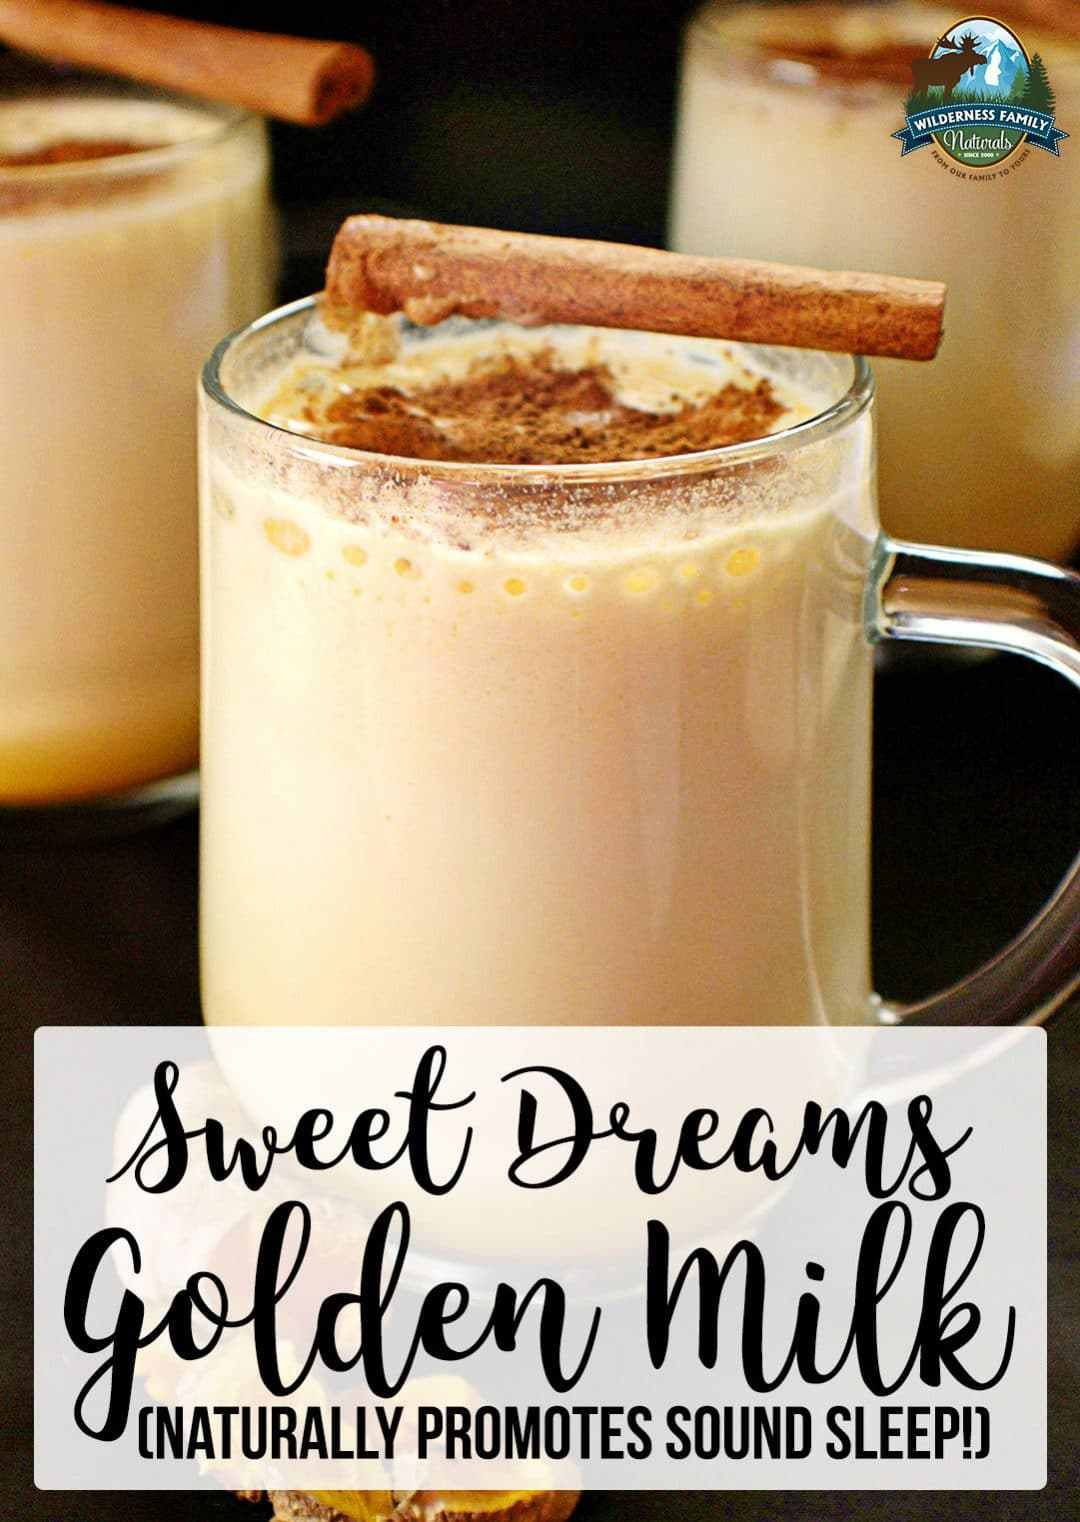 sweet dreams golden milk (naturally promotes sound sleep!) | recipe